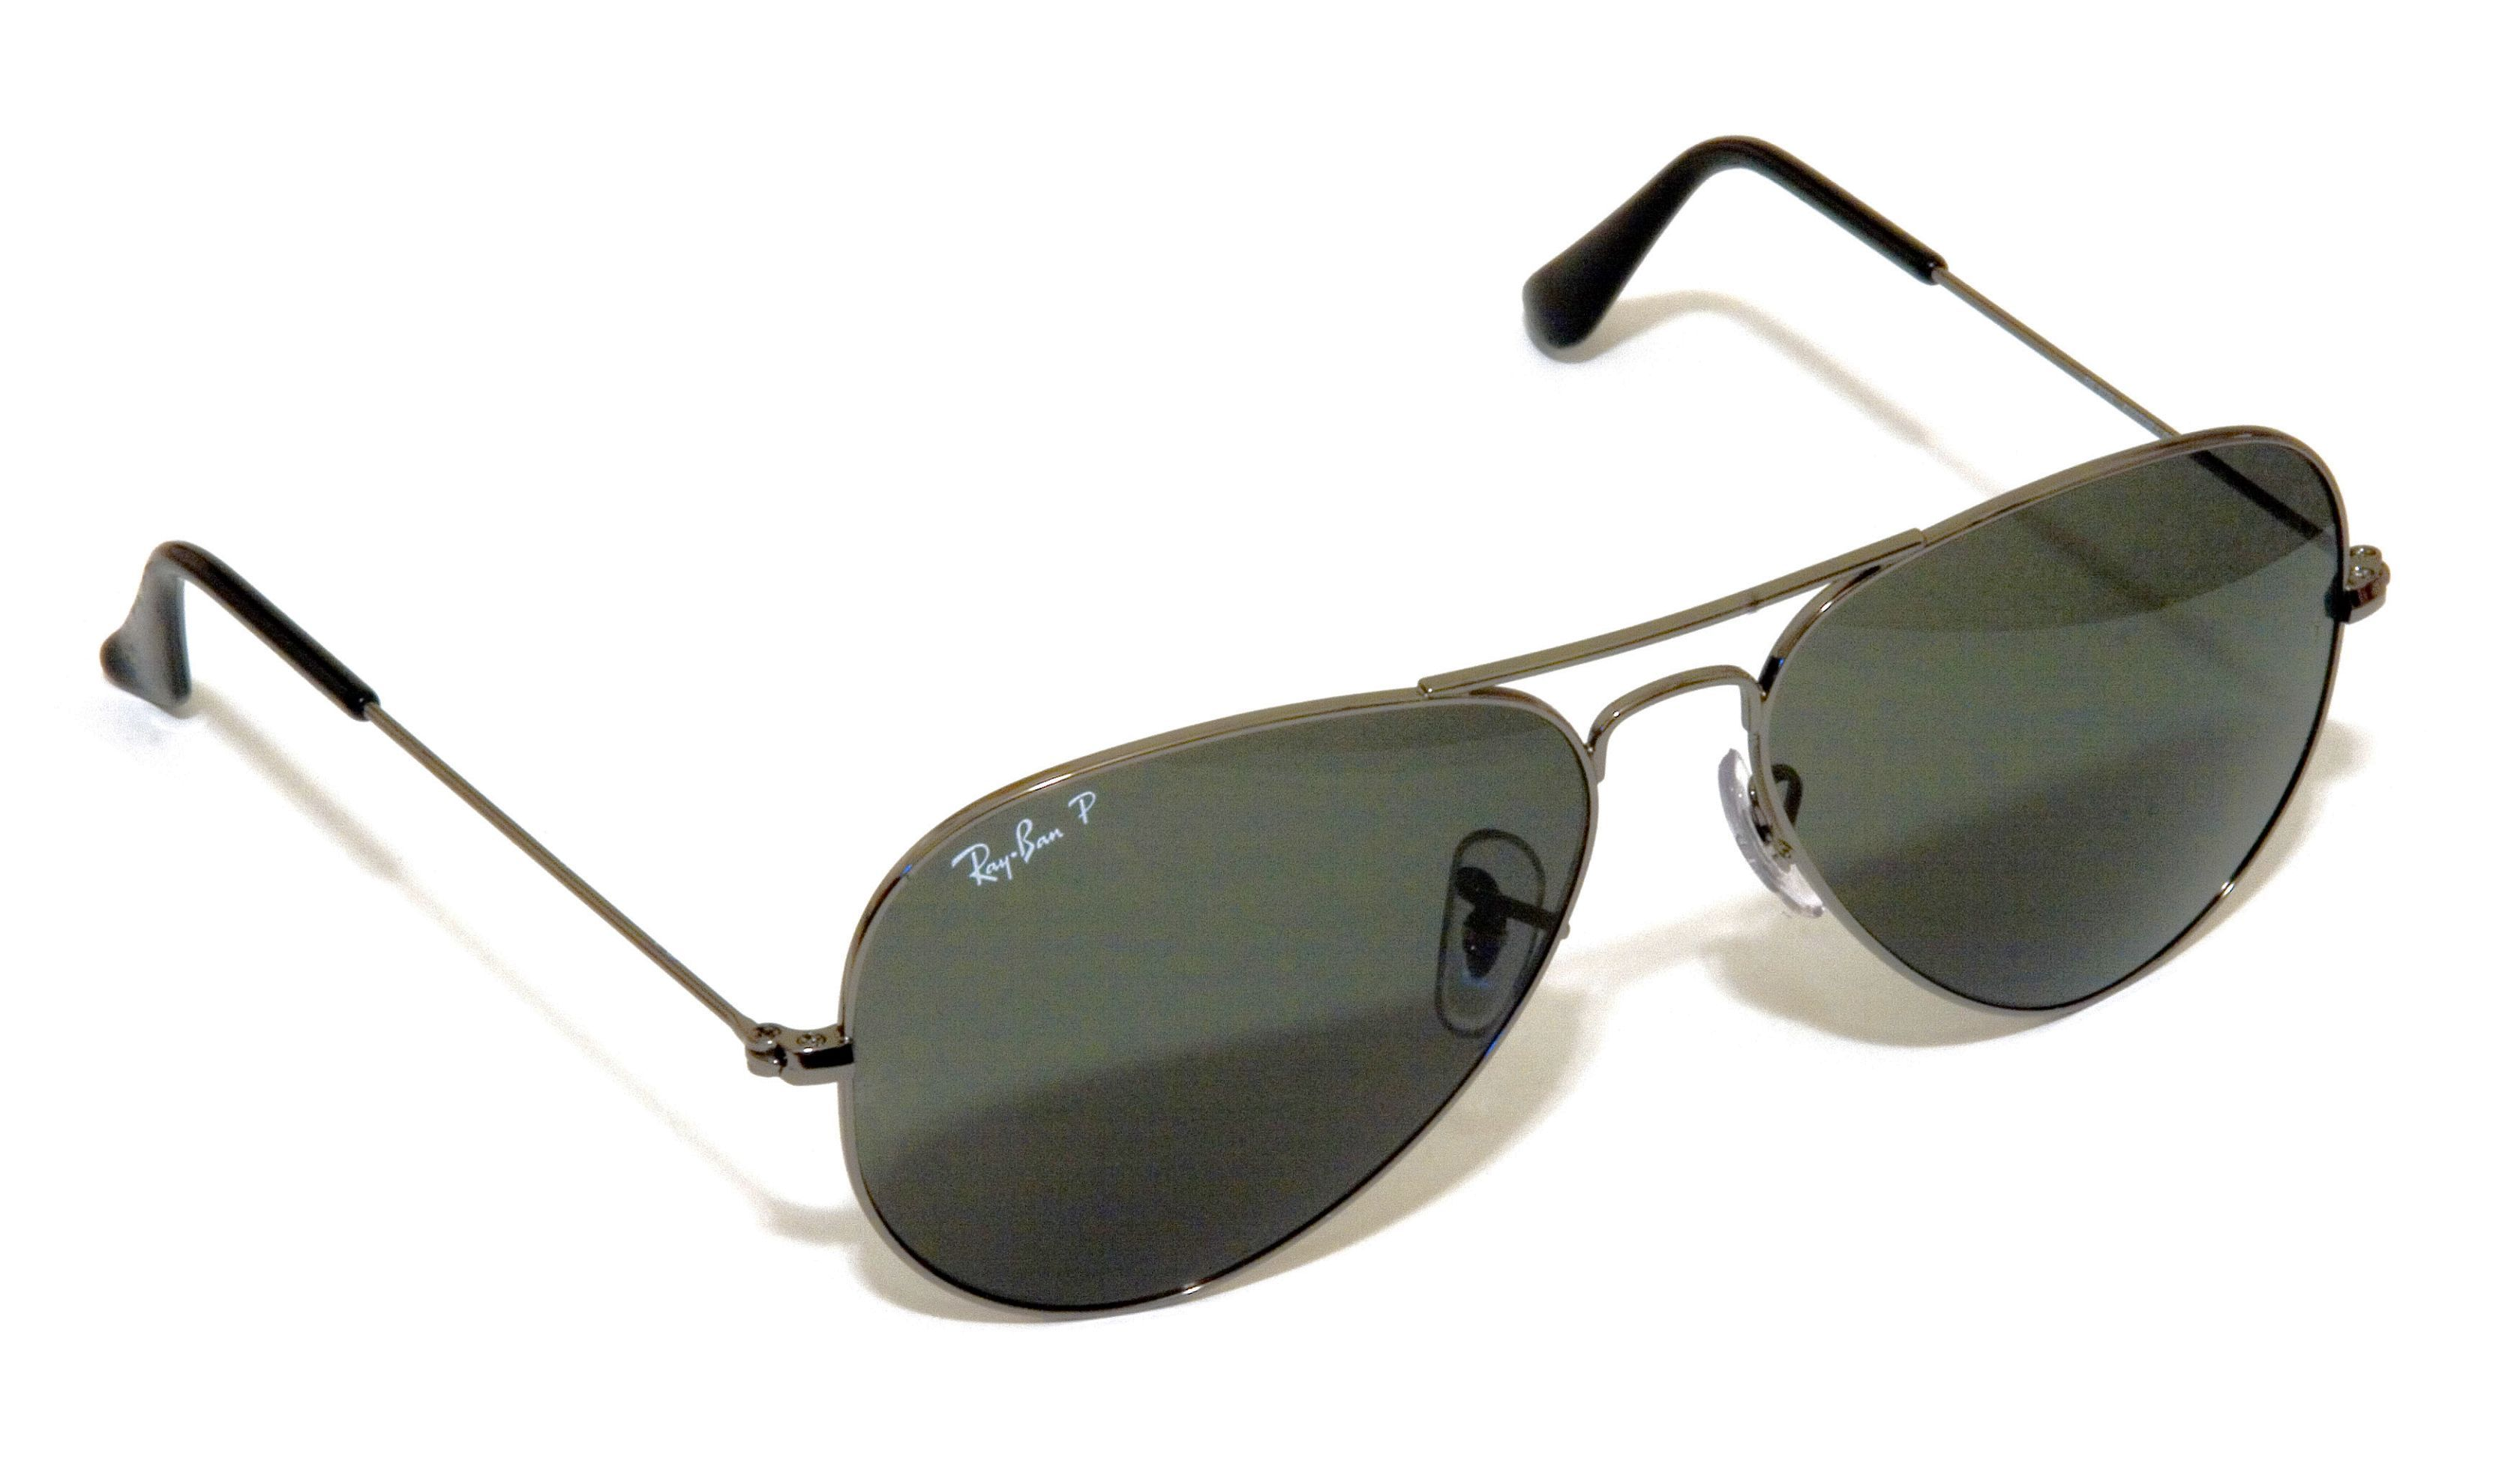 Cat Eye Sunglasses   I Still Love You NYC 3056b423d3